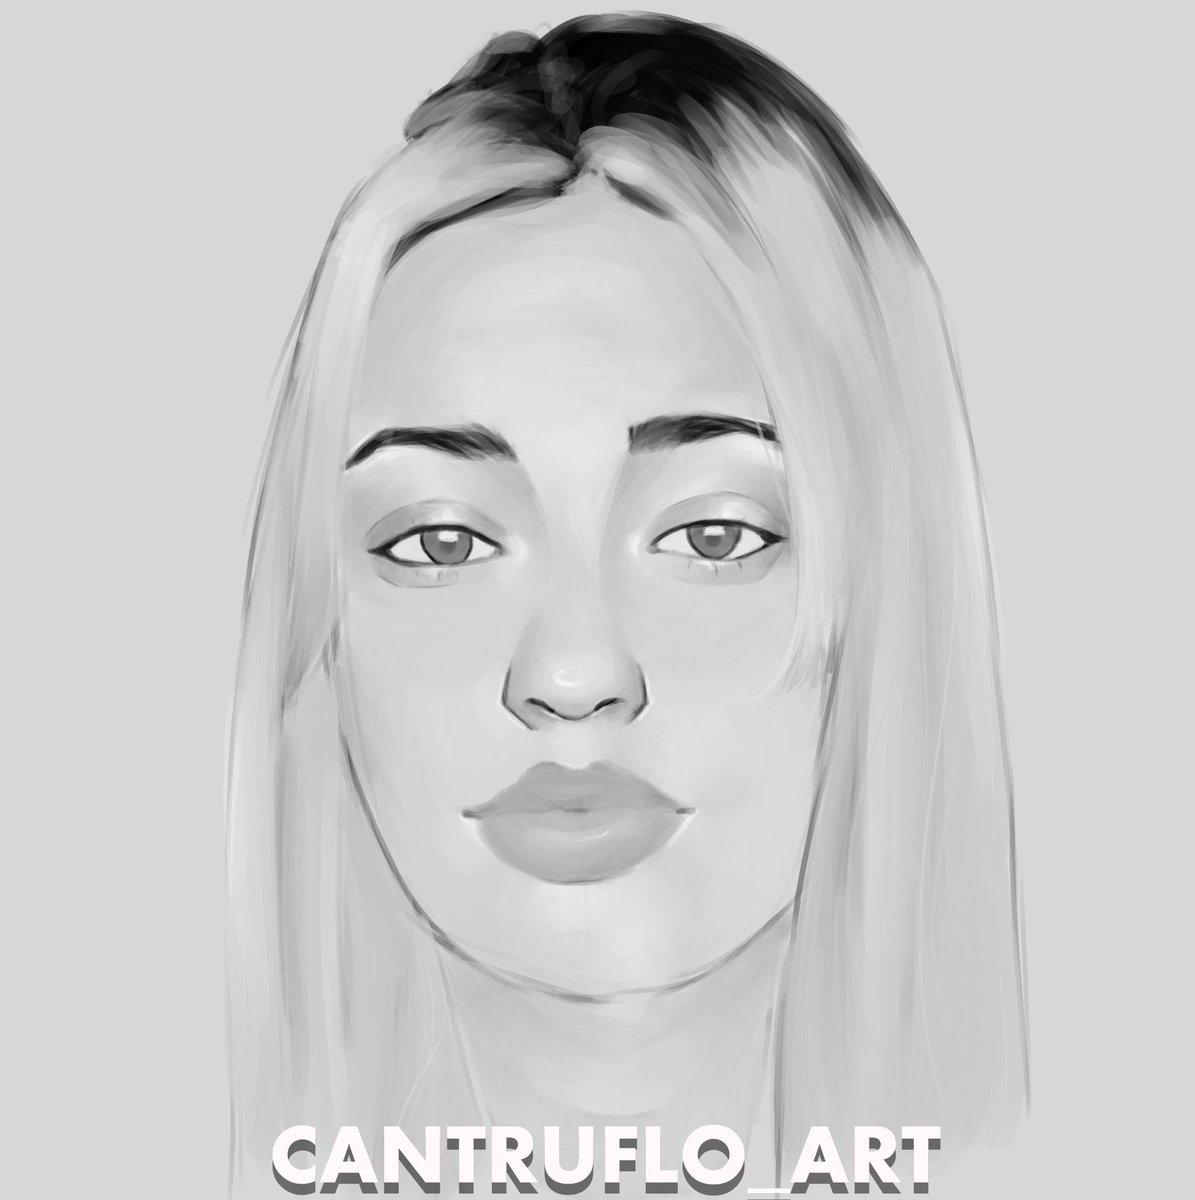 🖤Portrait🤍 . . . . . . . #dibujos #drawing #art #arte #dibujo #draw #drawings #ilustracion #artist #sketch #digitalart #dibujosalapiz #illustration #anime #artwork #fanart #dibujodigital #sketchbook #dise #artista #painting #o #draws #ilustraciones